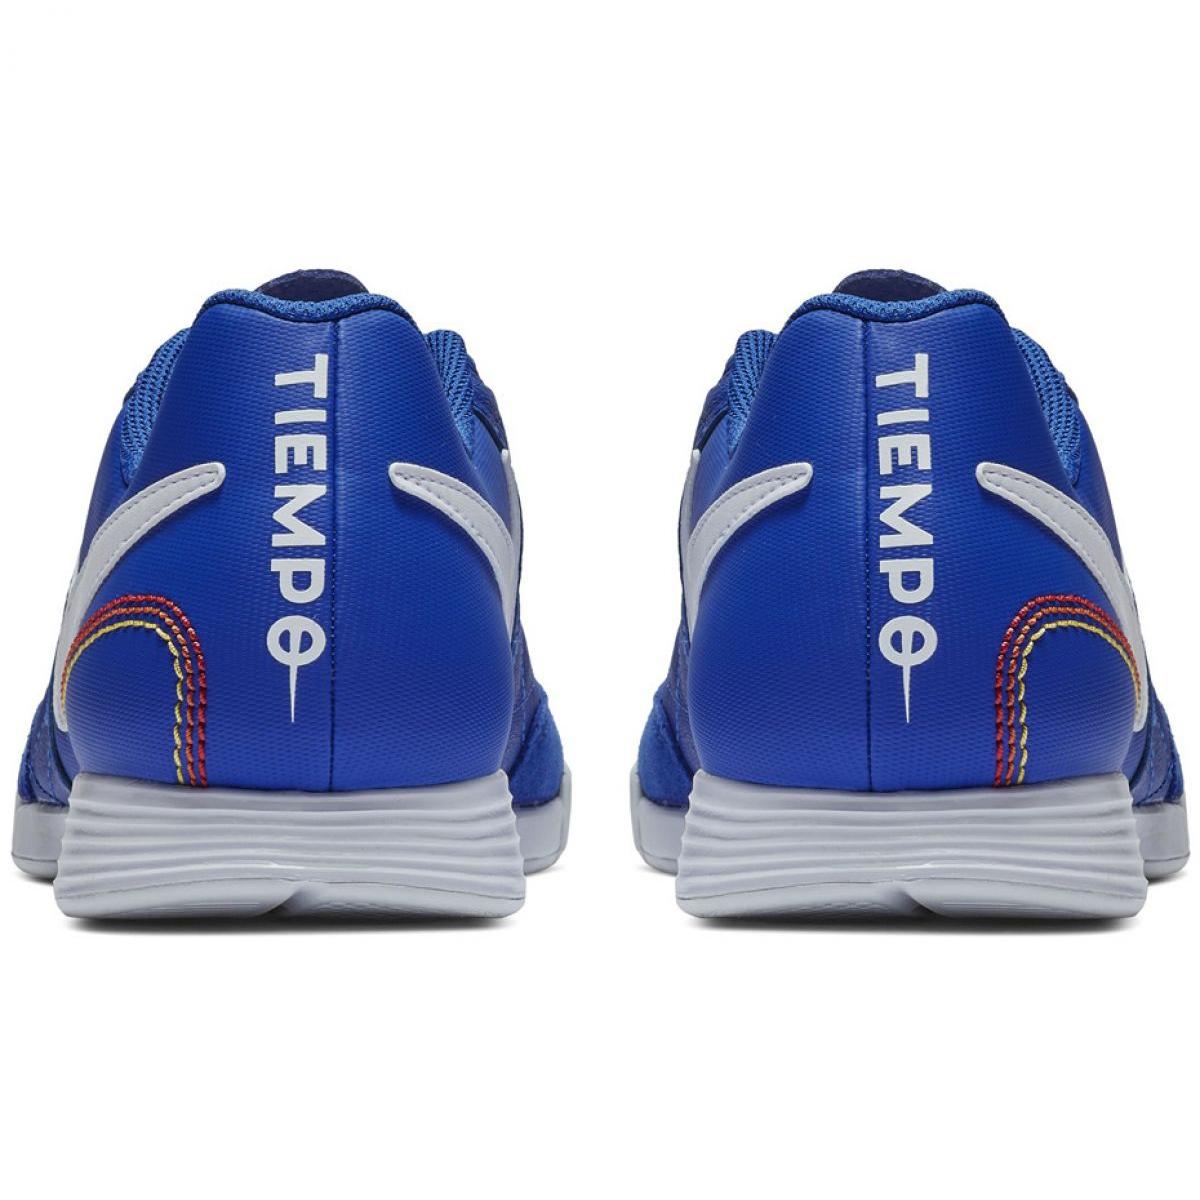 quality design c7151 ee0e6 Indoor shoes Nike Tiempo Legend X 7 Academy 10R Ic M AQ2217-410